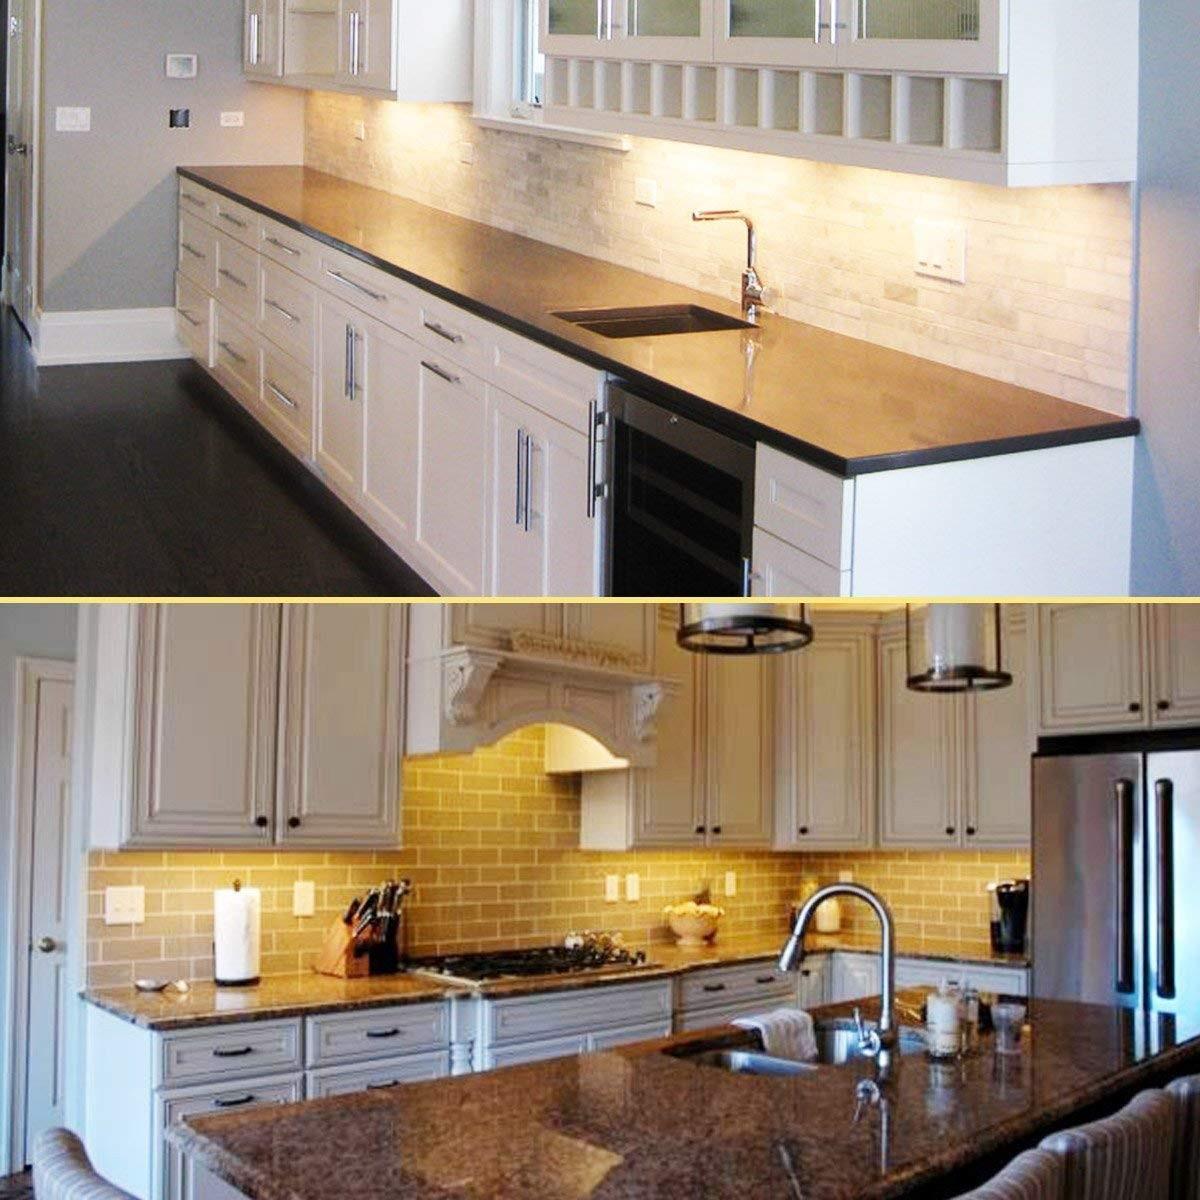 Kitchen Led Lights Under Cabinet  Ultra Thin LED Under Cabinet Counter Kitchen Lighting Kit